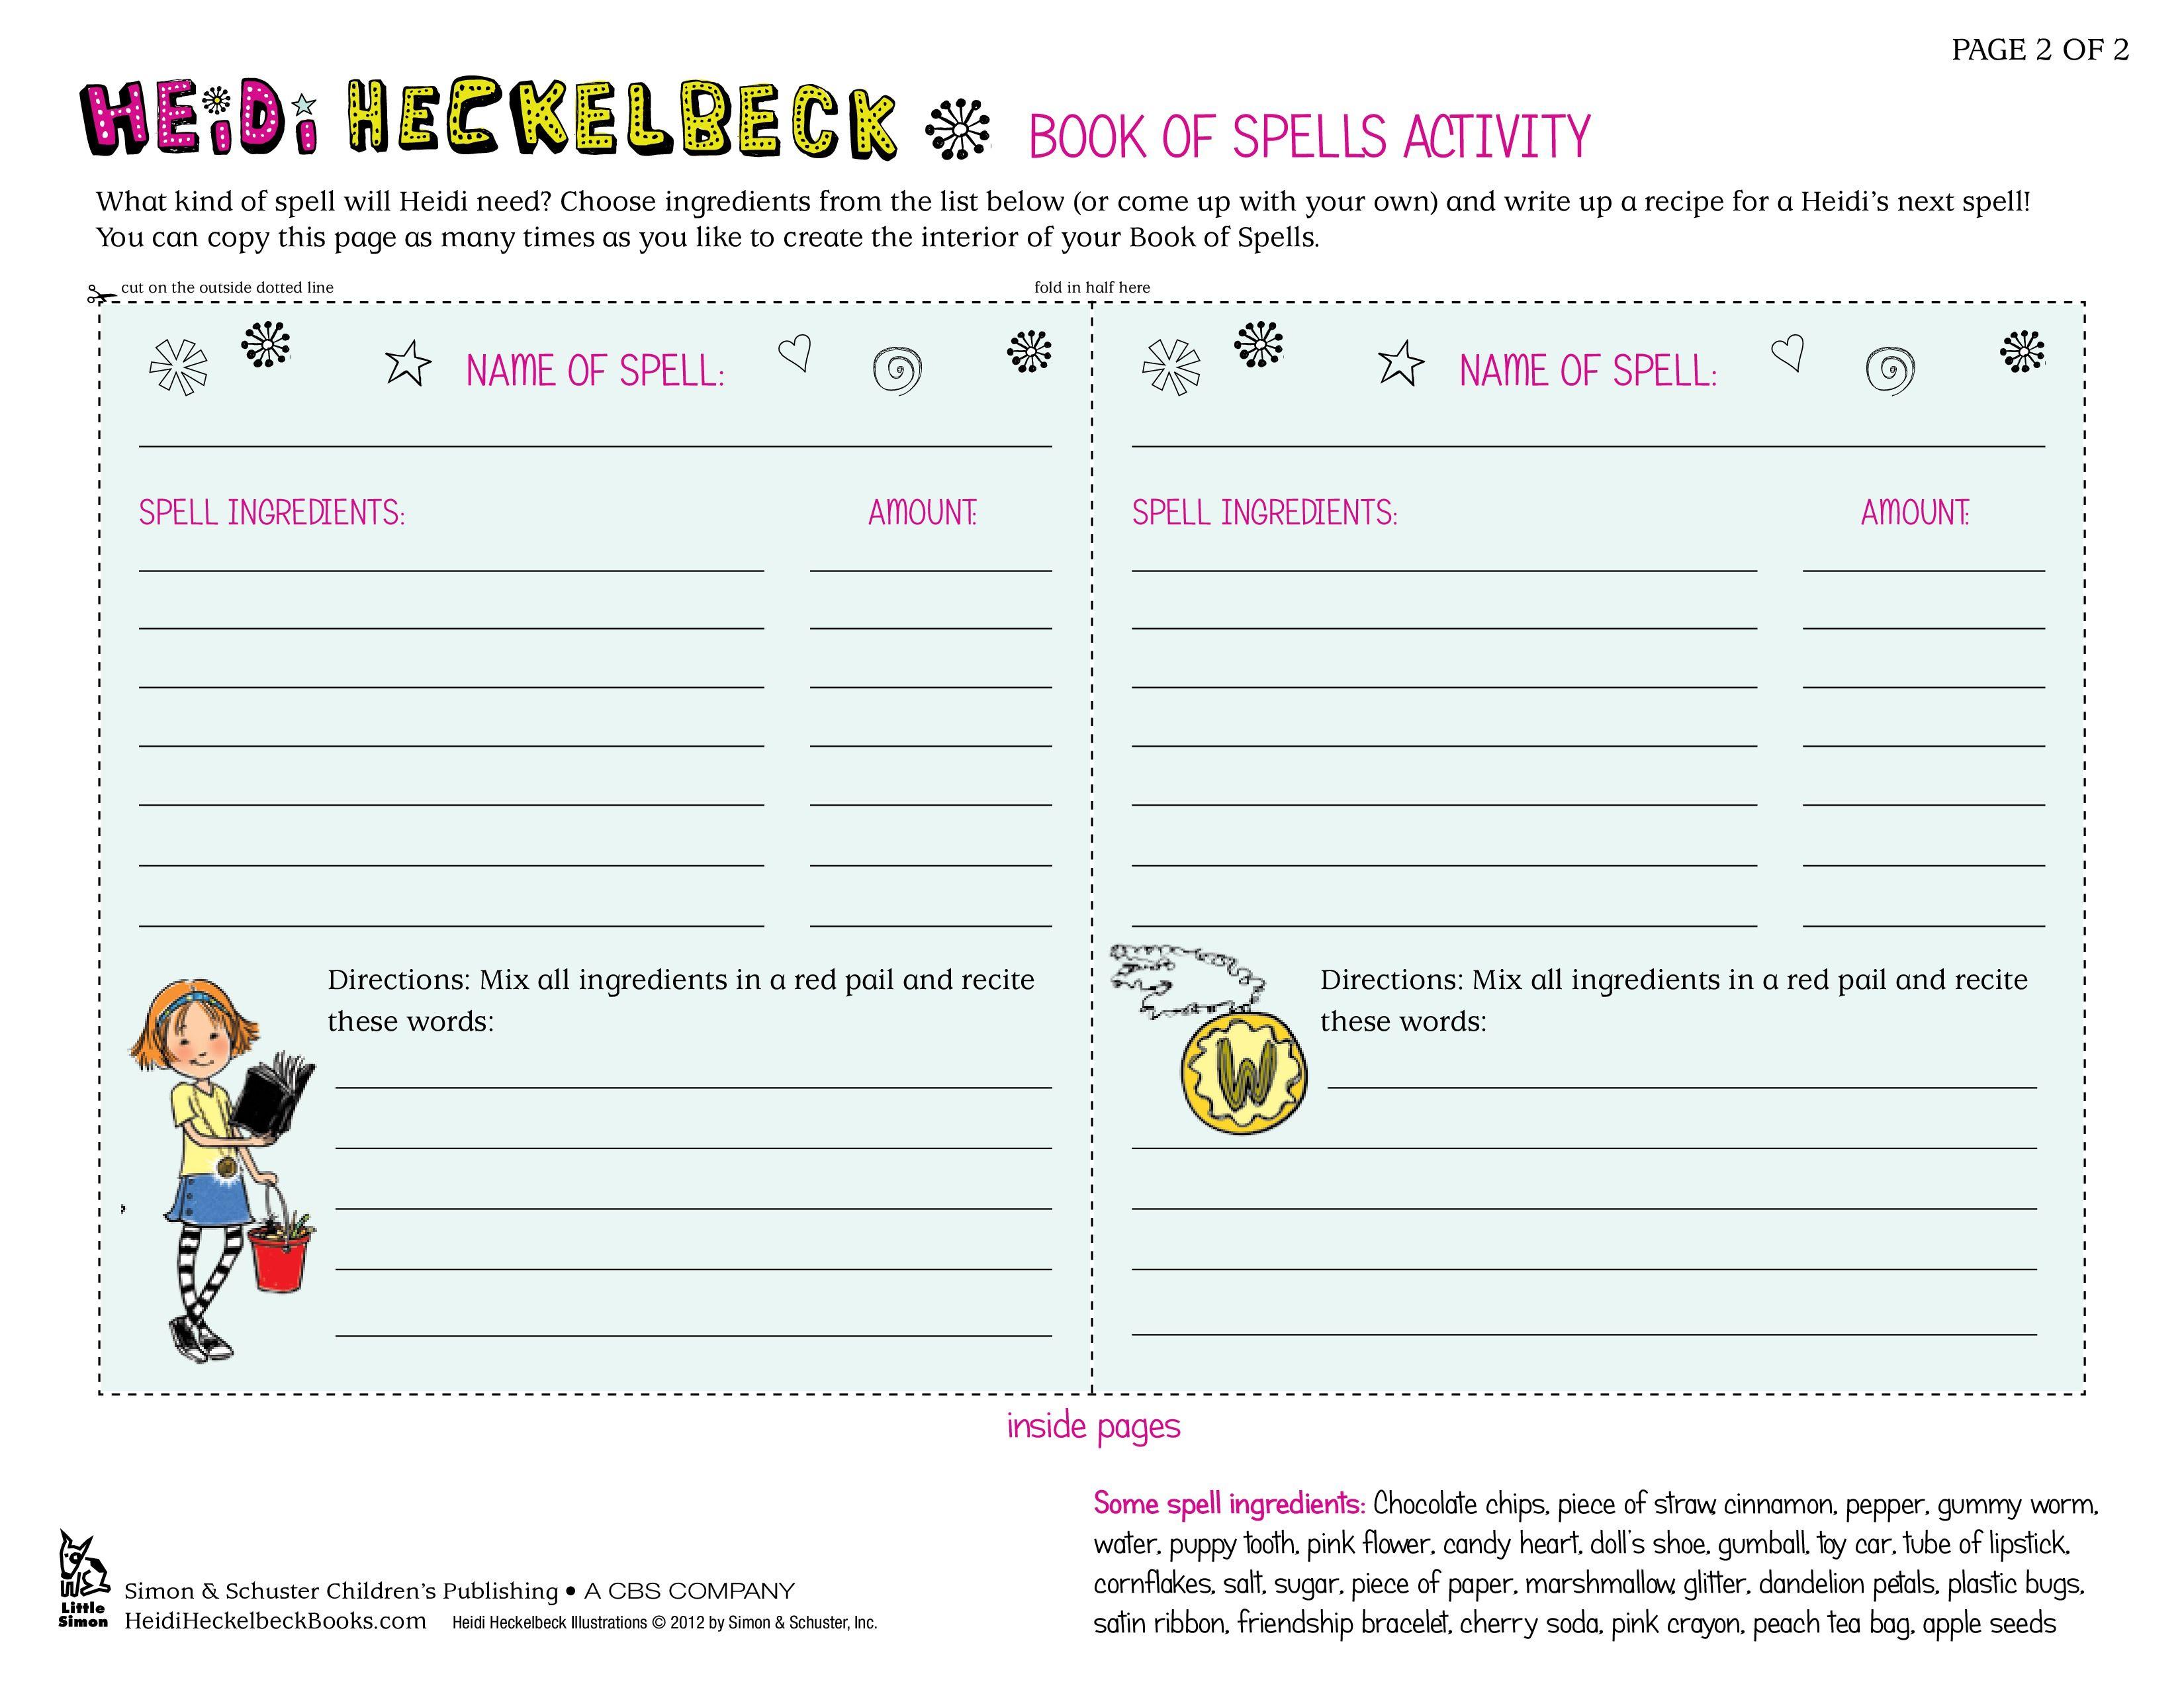 Heidi Hecklebeck - Book of Spells (Page 2)